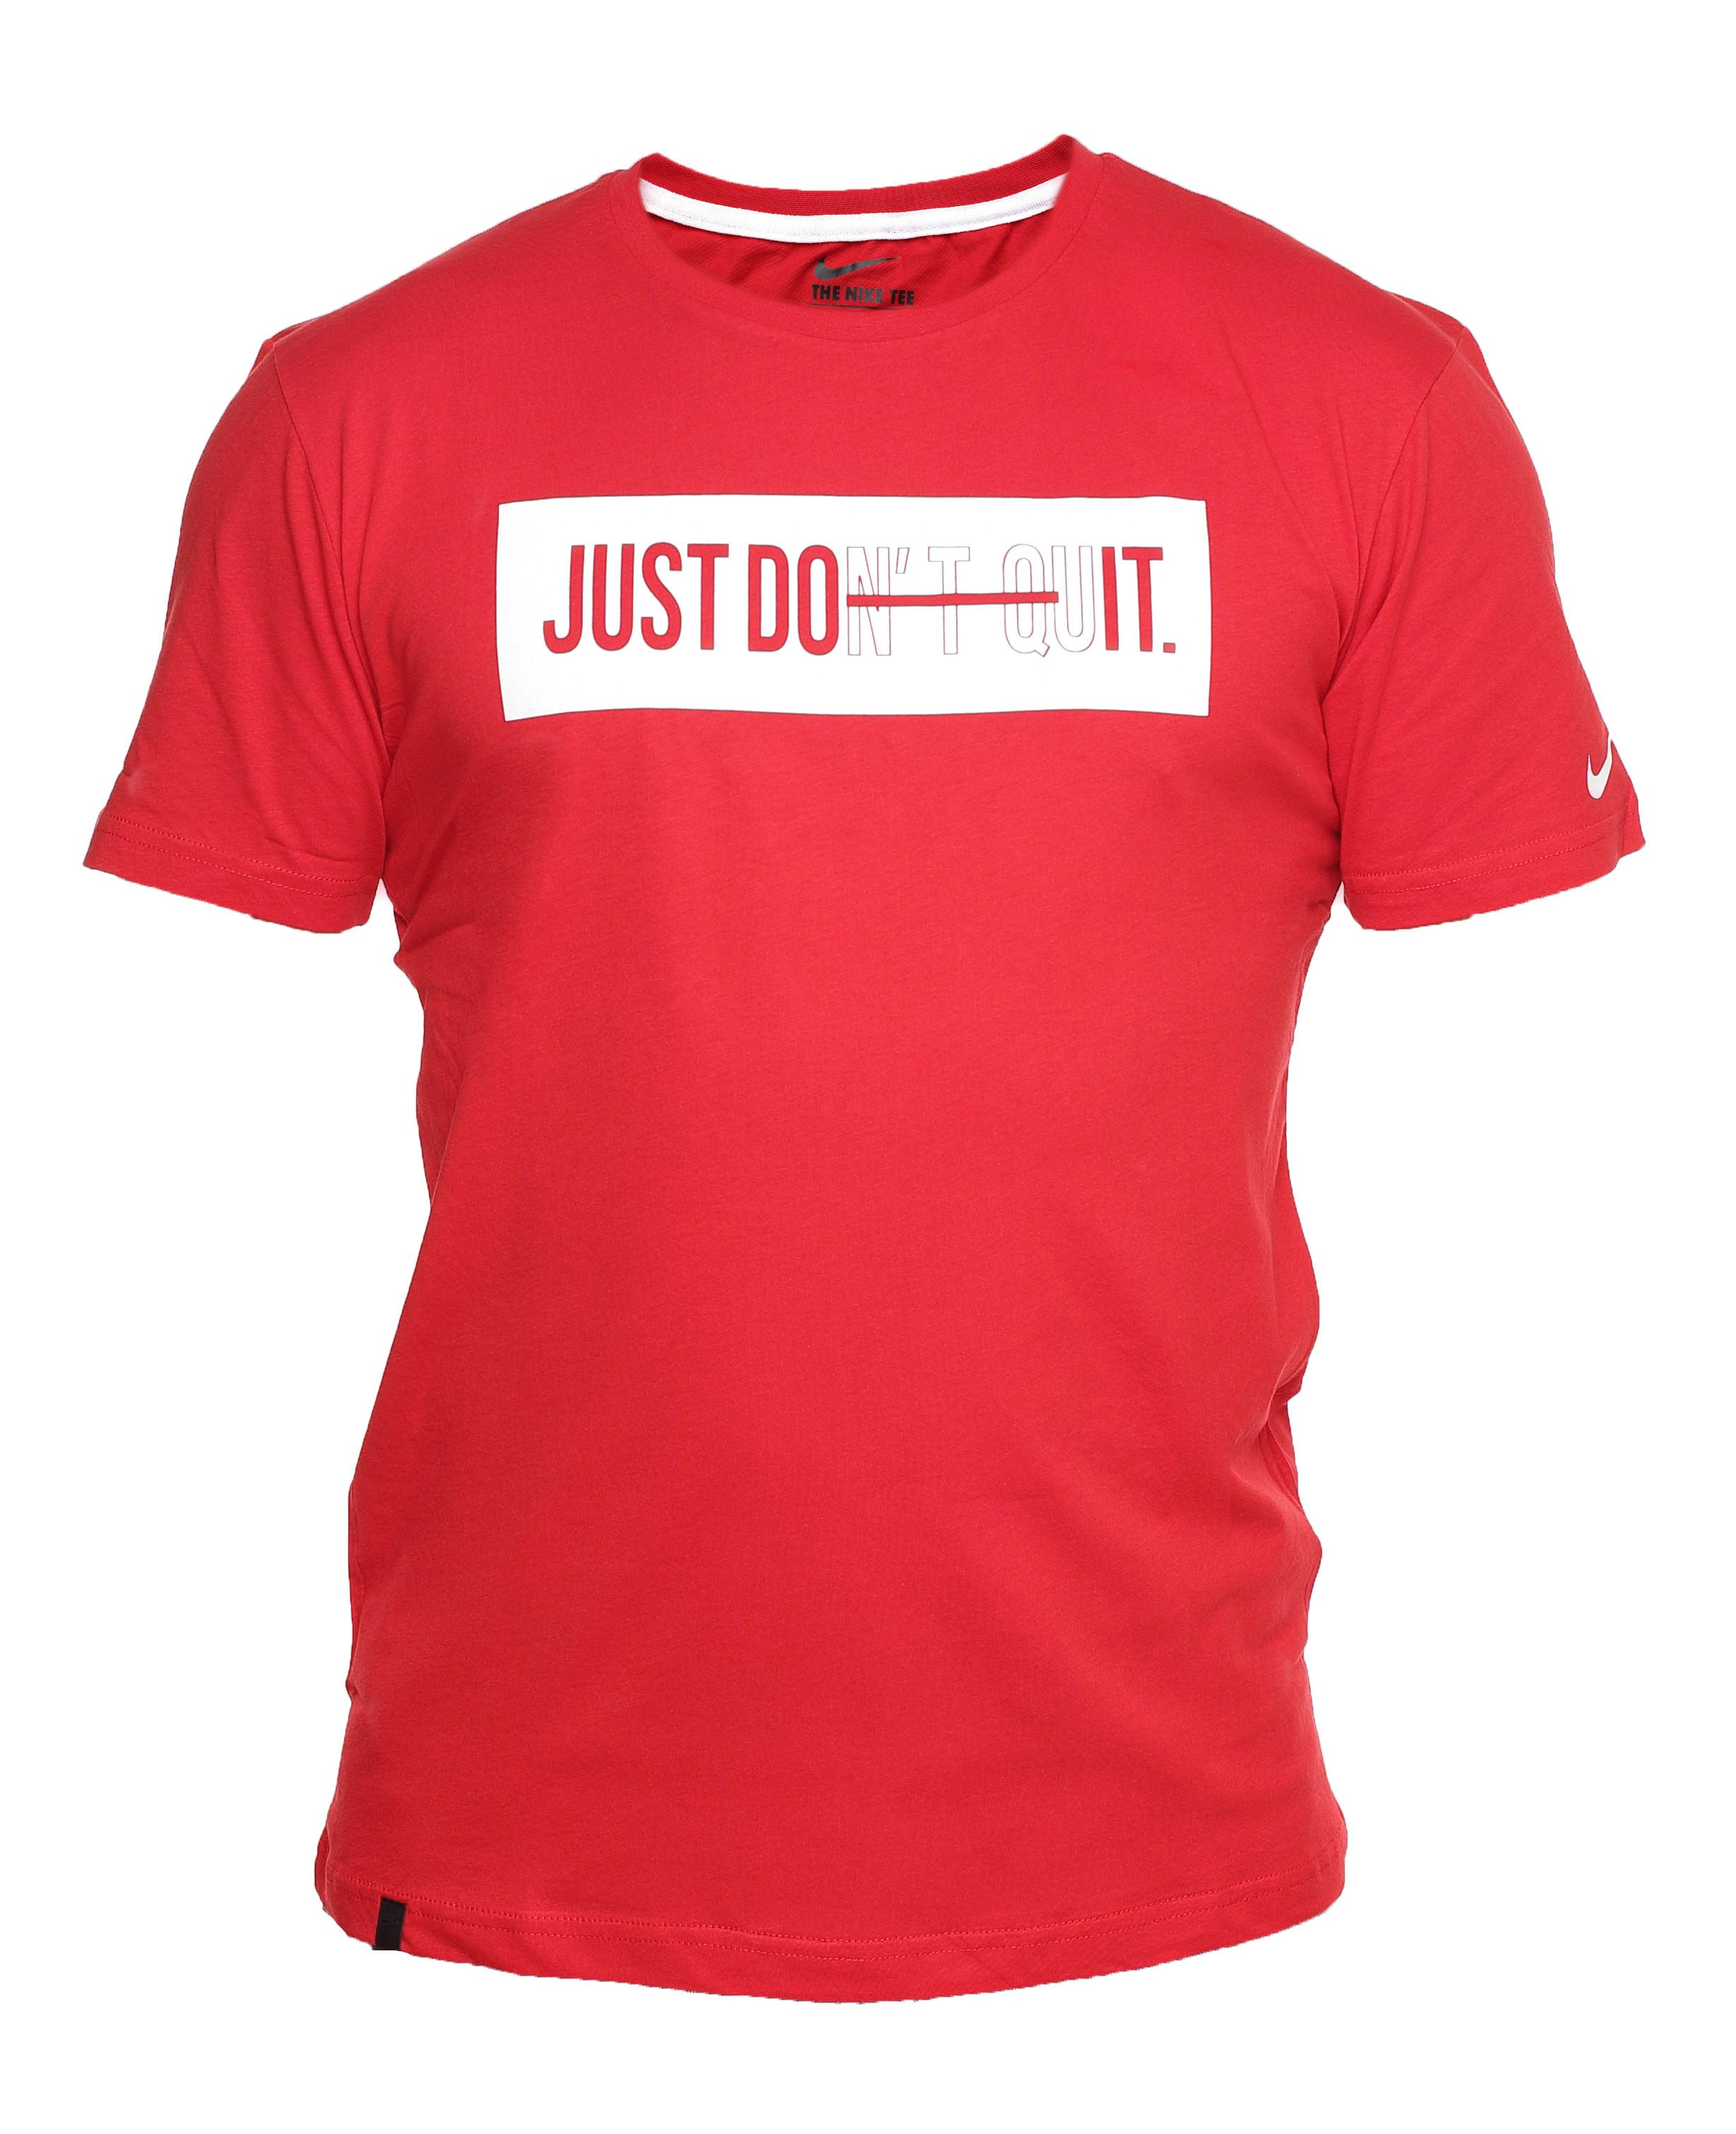 f4a65d69 Мужская Футболка Nike Just Do It Red 9466: где купить недорого - по ...